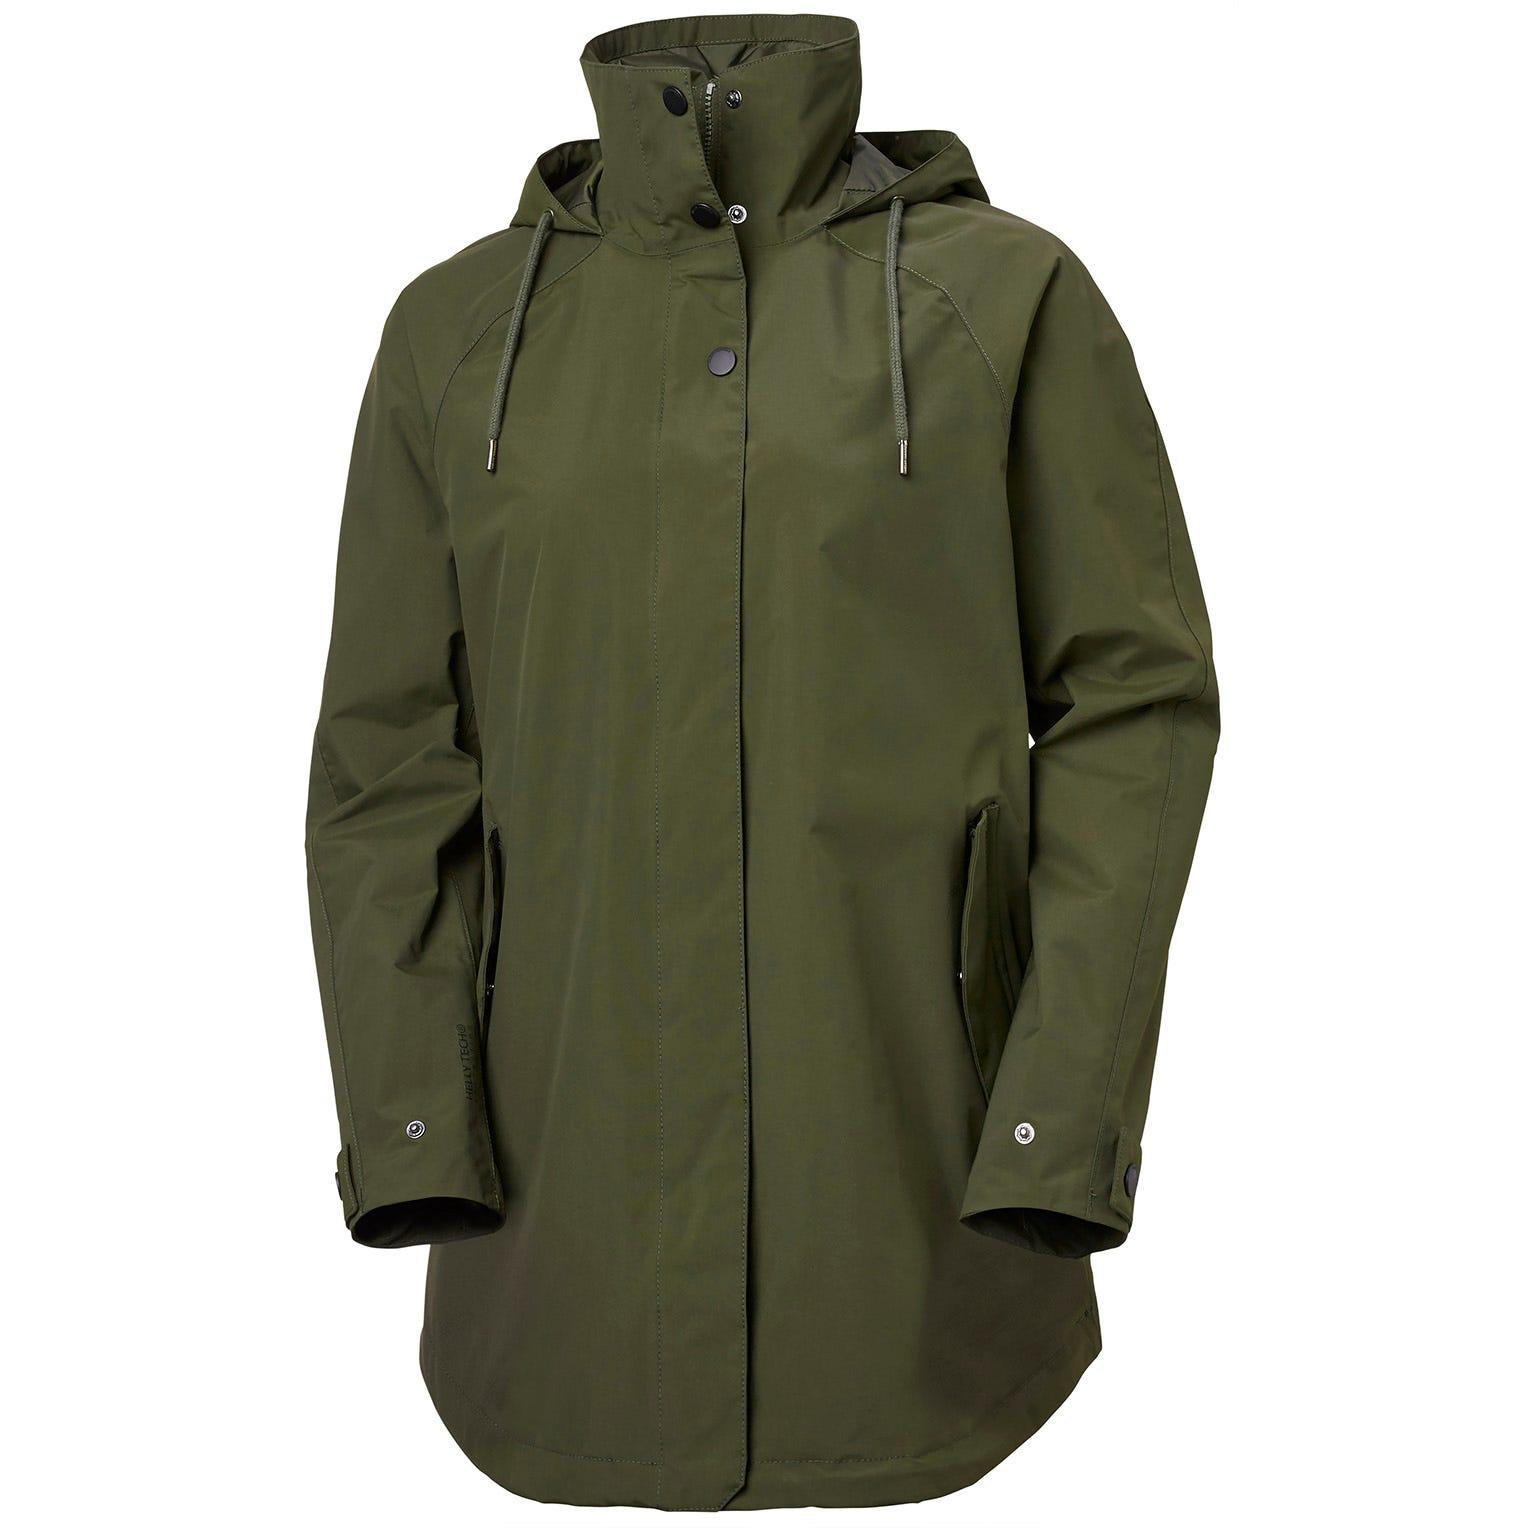 Womens Valentia Windproof Raincoat | Uk Helly Hansen Womens Rain Jacket Green XL